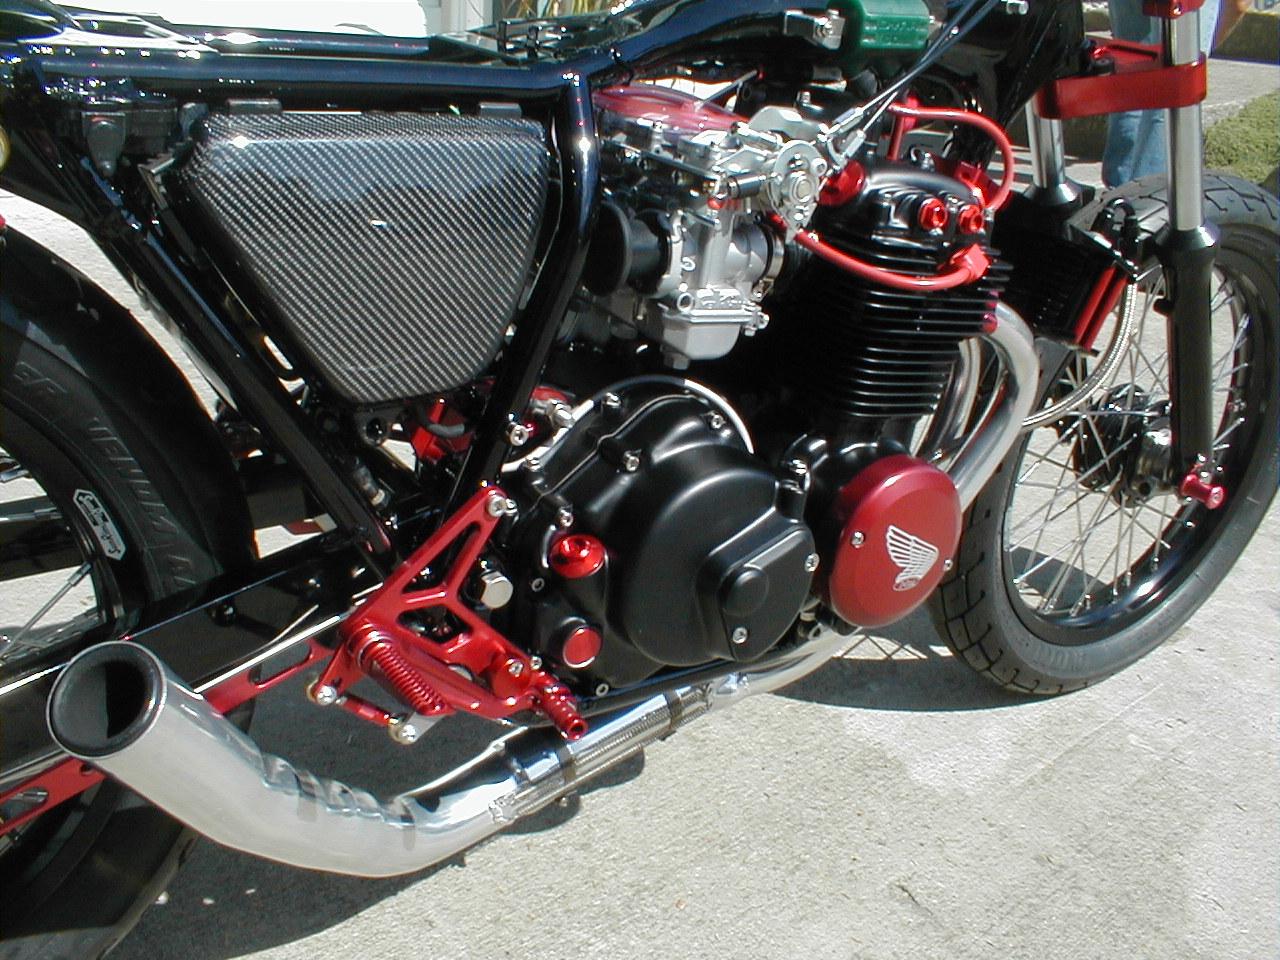 clean red n black cb400f | 4into1.com Vintage Honda ...